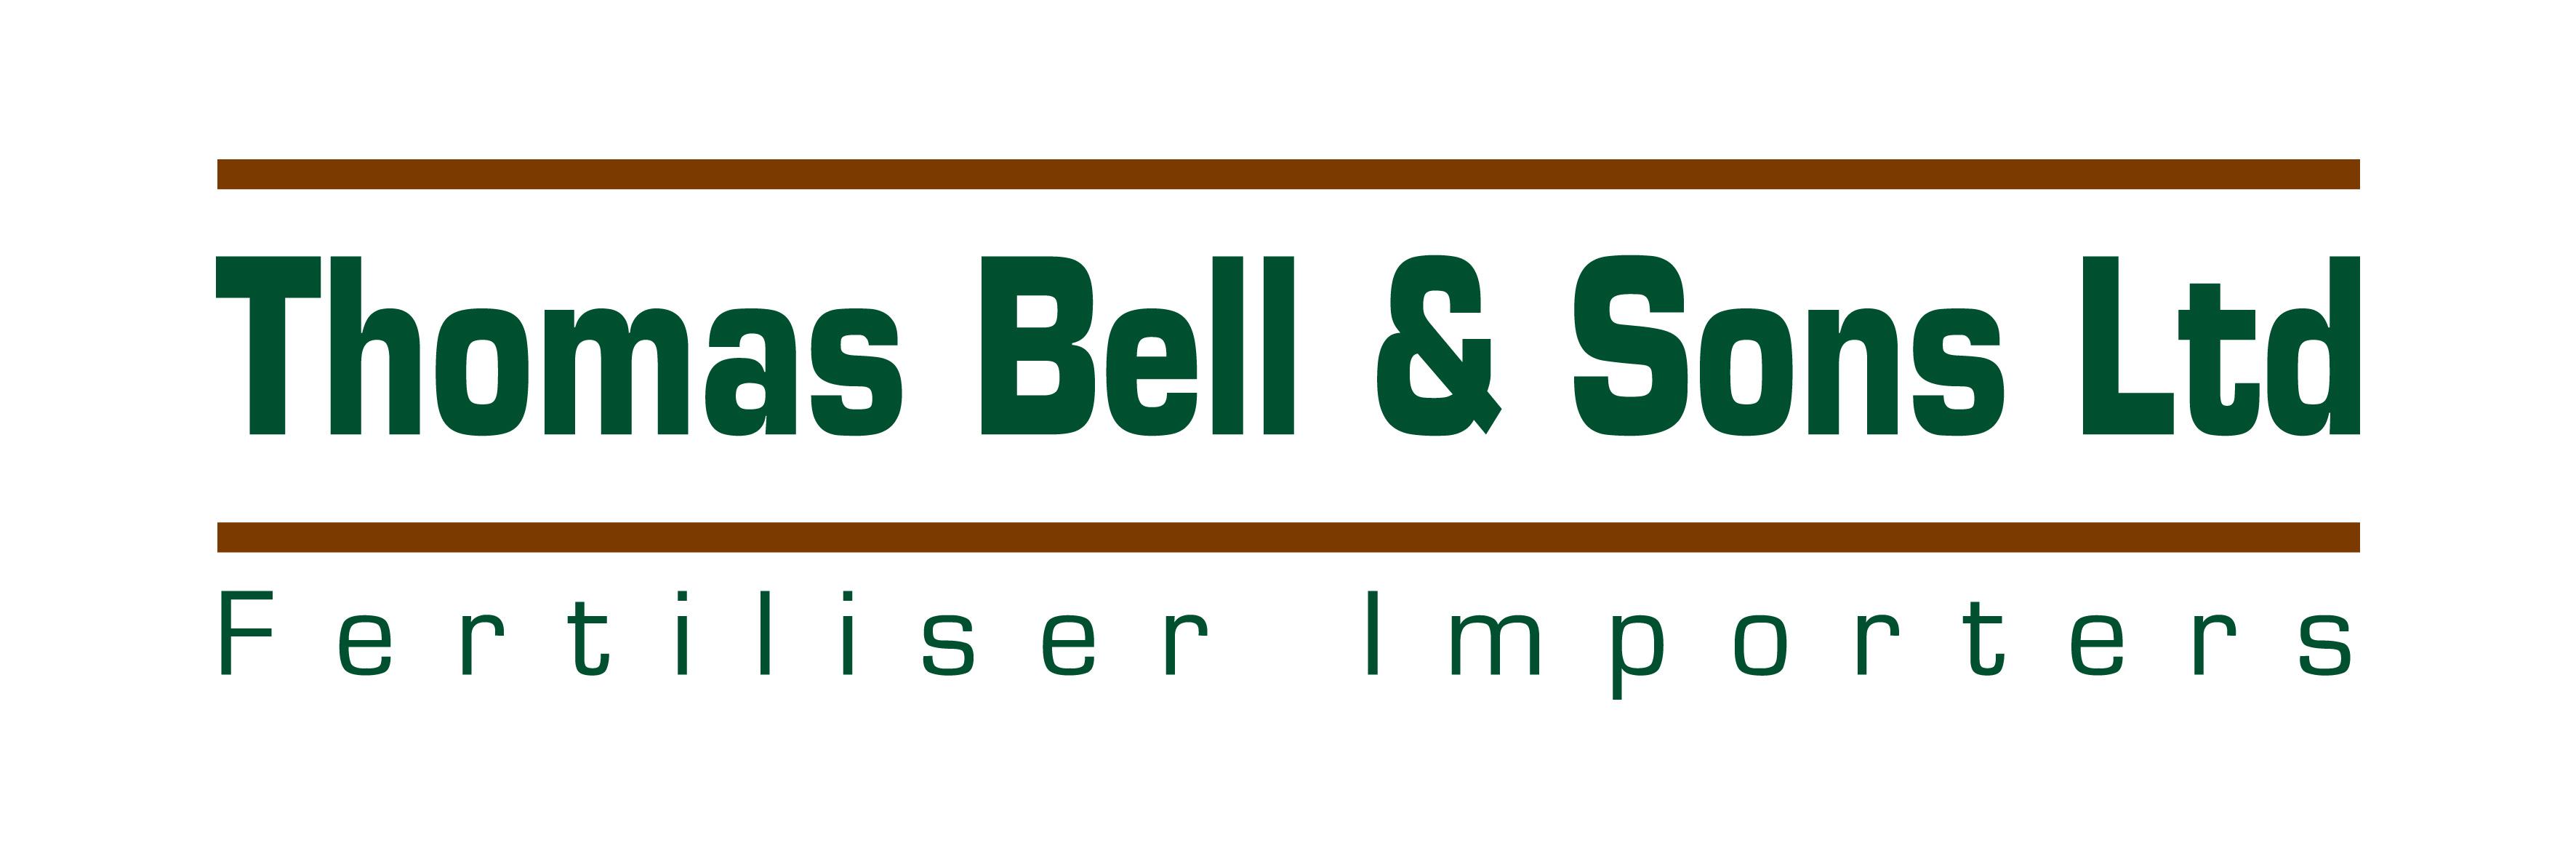 Thomas Bell  Fertiliser PULAN LITHAN DIAMOND ZAKSAN